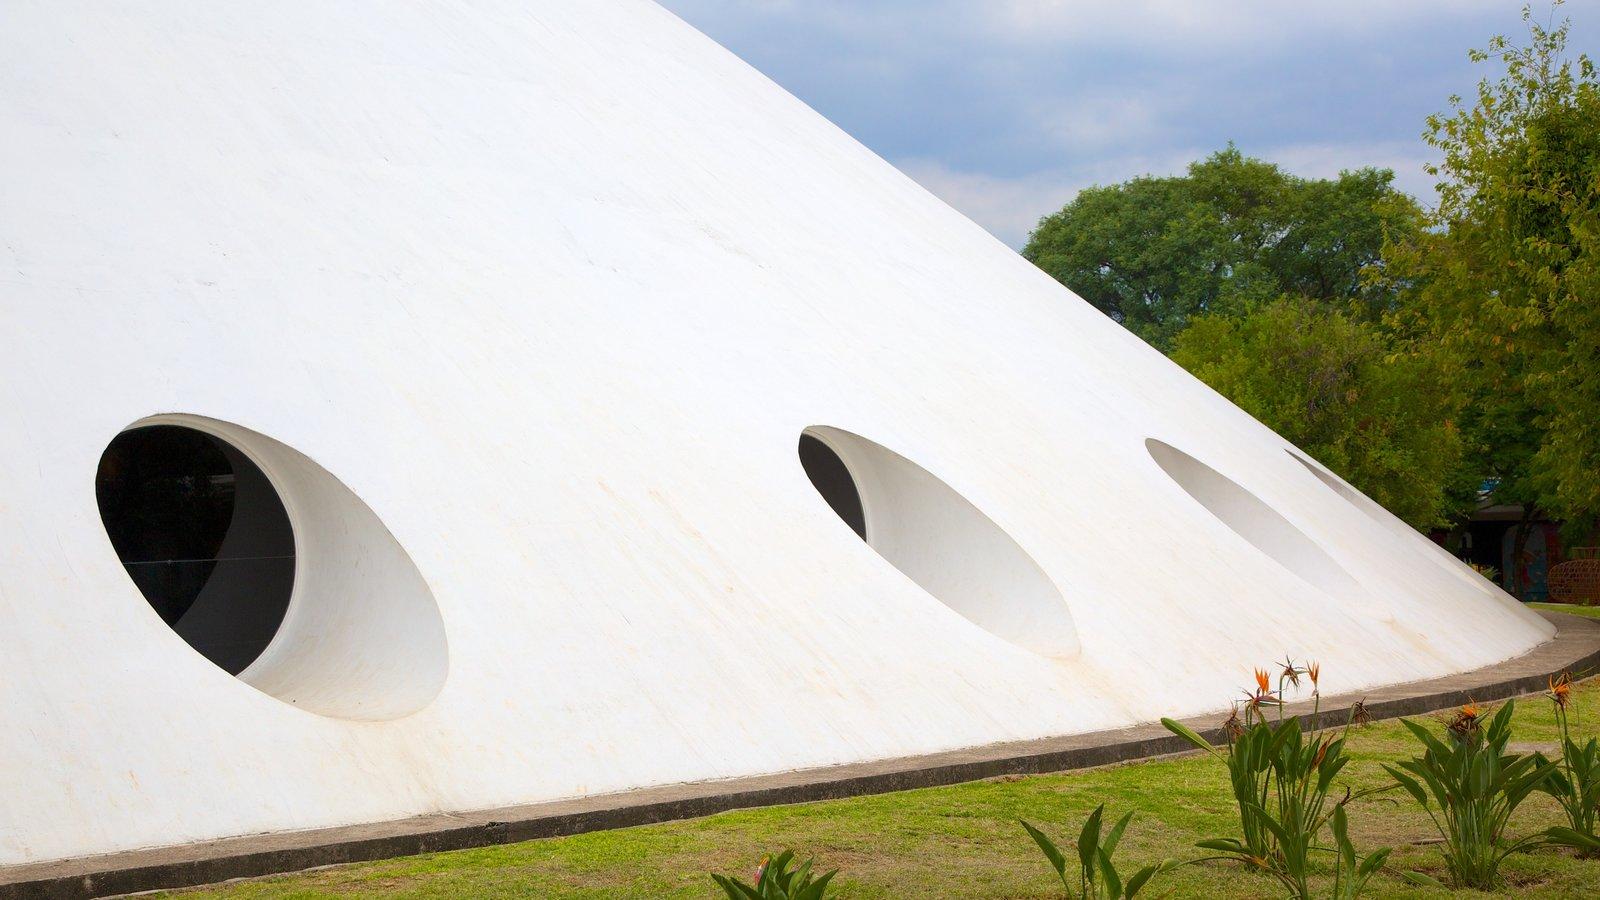 Parque do Ibirapuera caracterizando arquitetura moderna